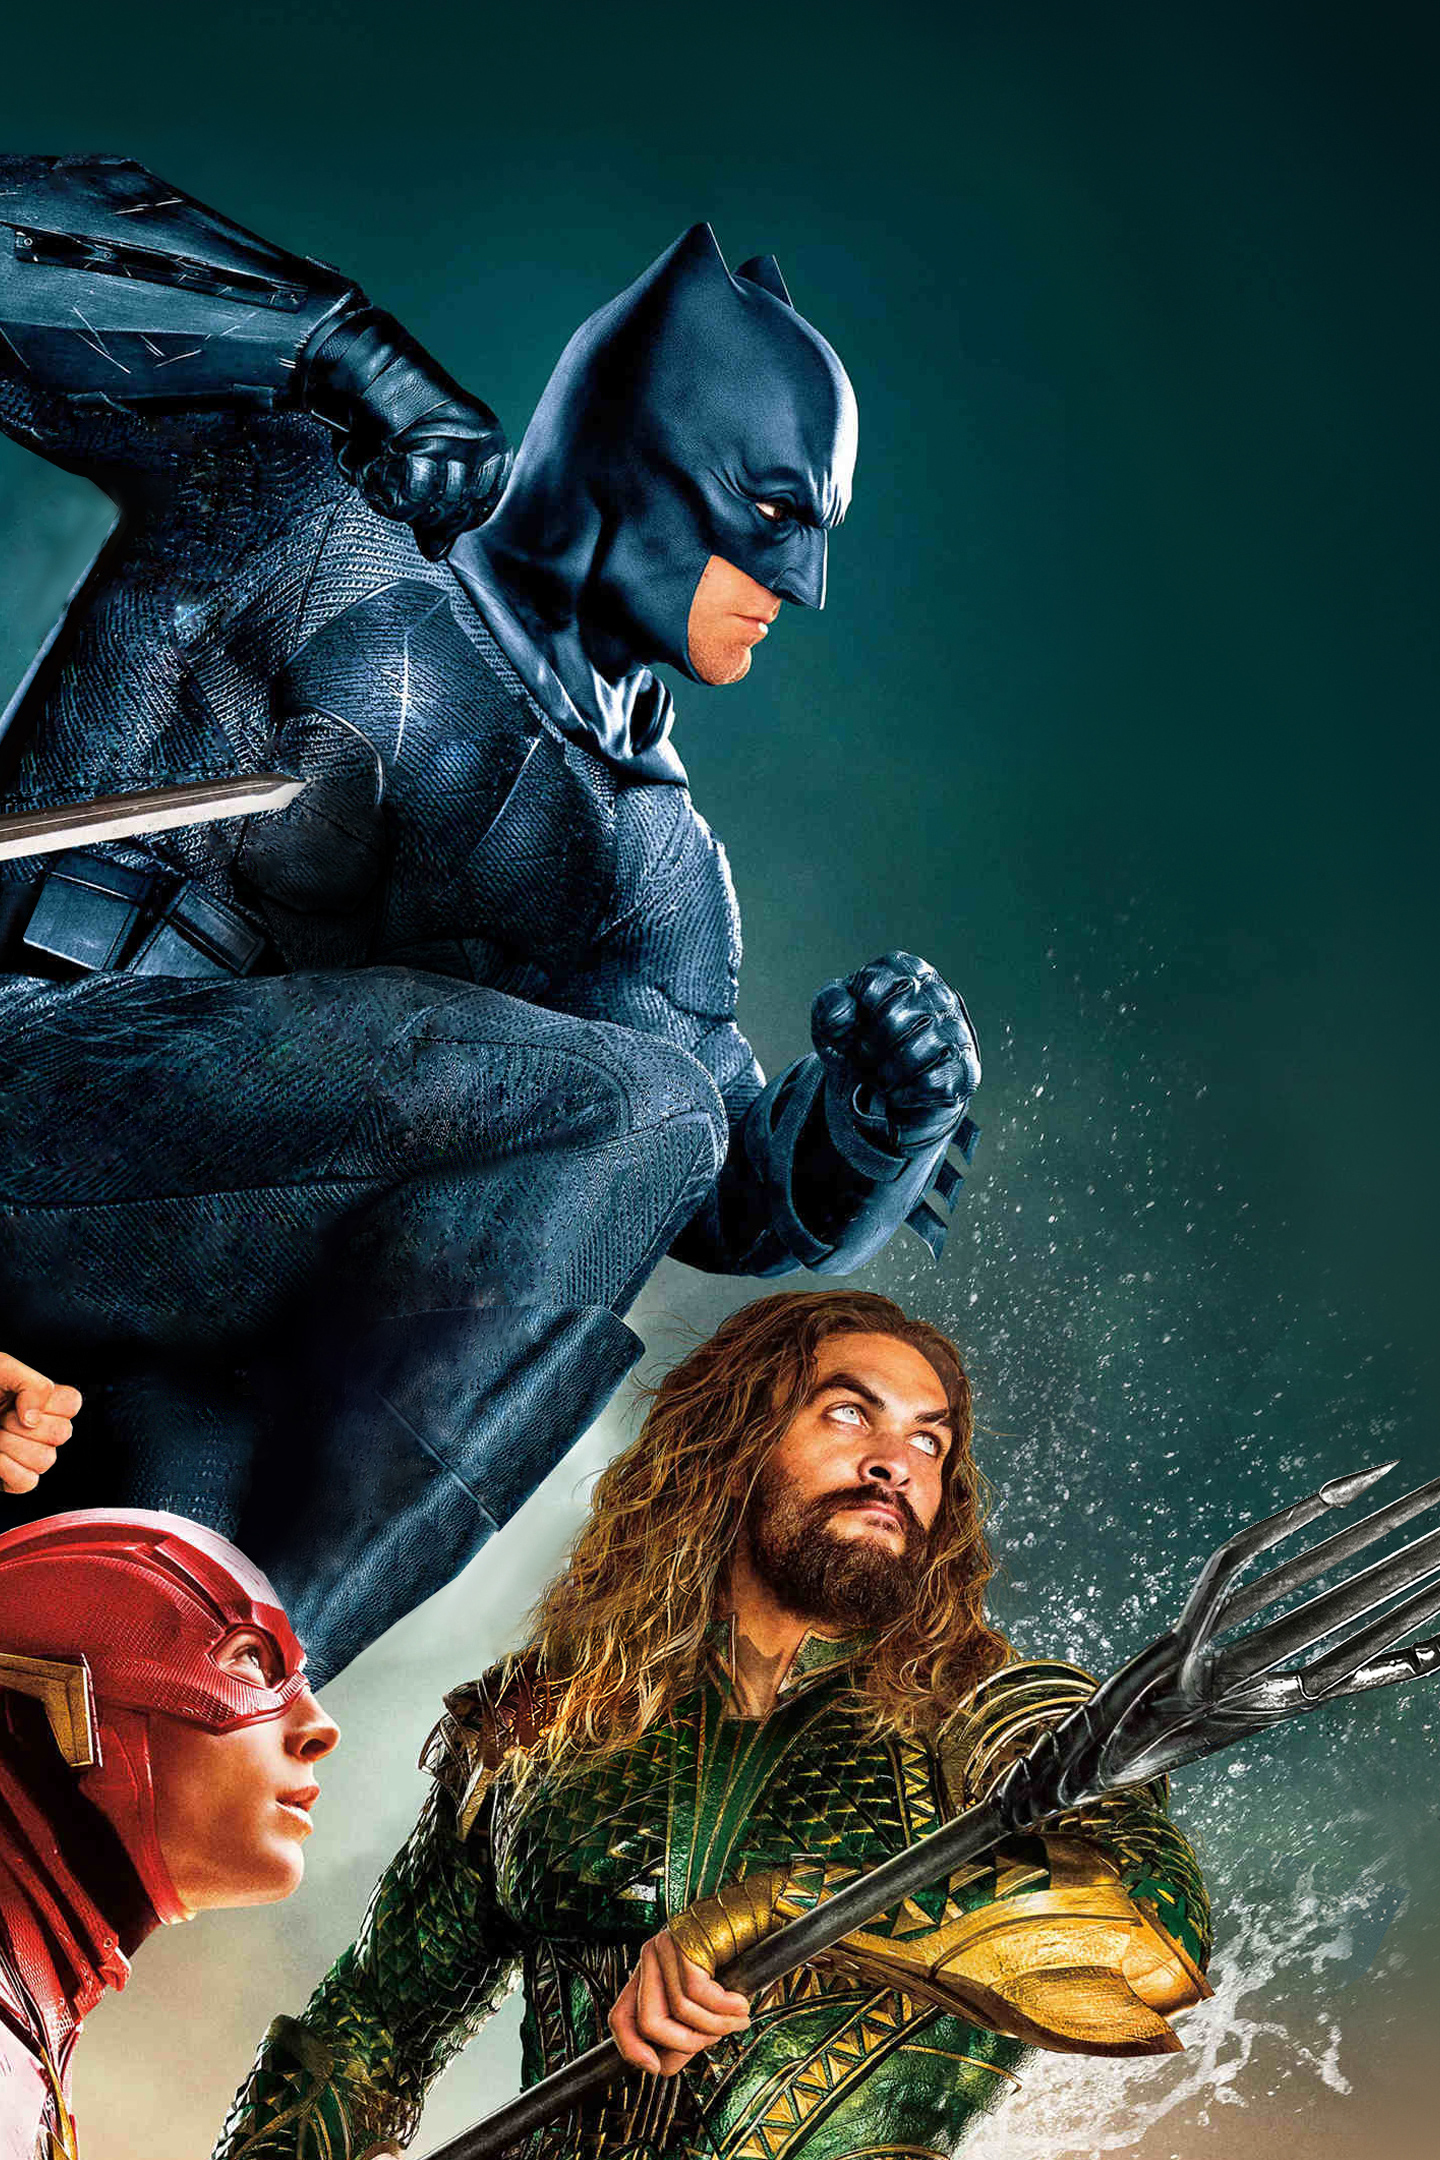 Justice league, movie, superheroes, 1440x2630 wallpaper